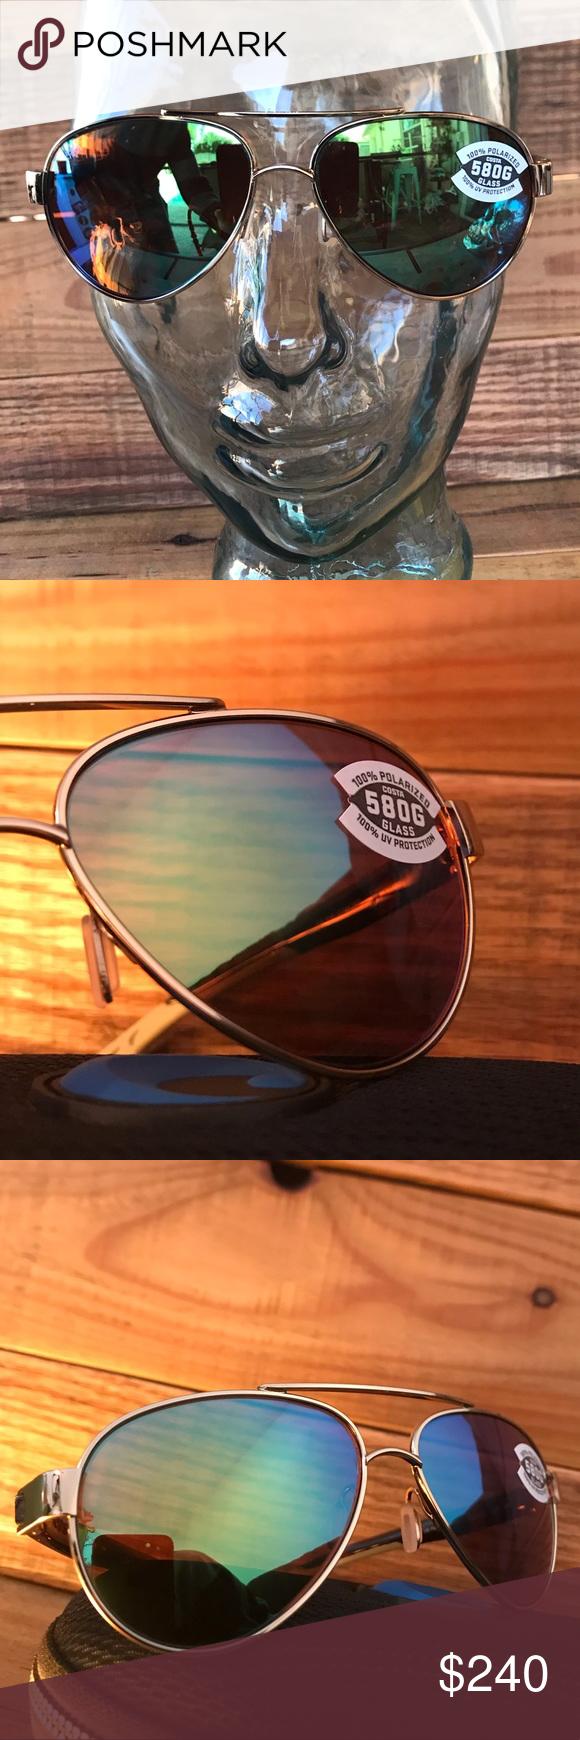 32c7a7123ad31 NWT Costa Del Mar gold aviators green mirror 580G Info coming soon unisex  Costa Accessories Sunglasses